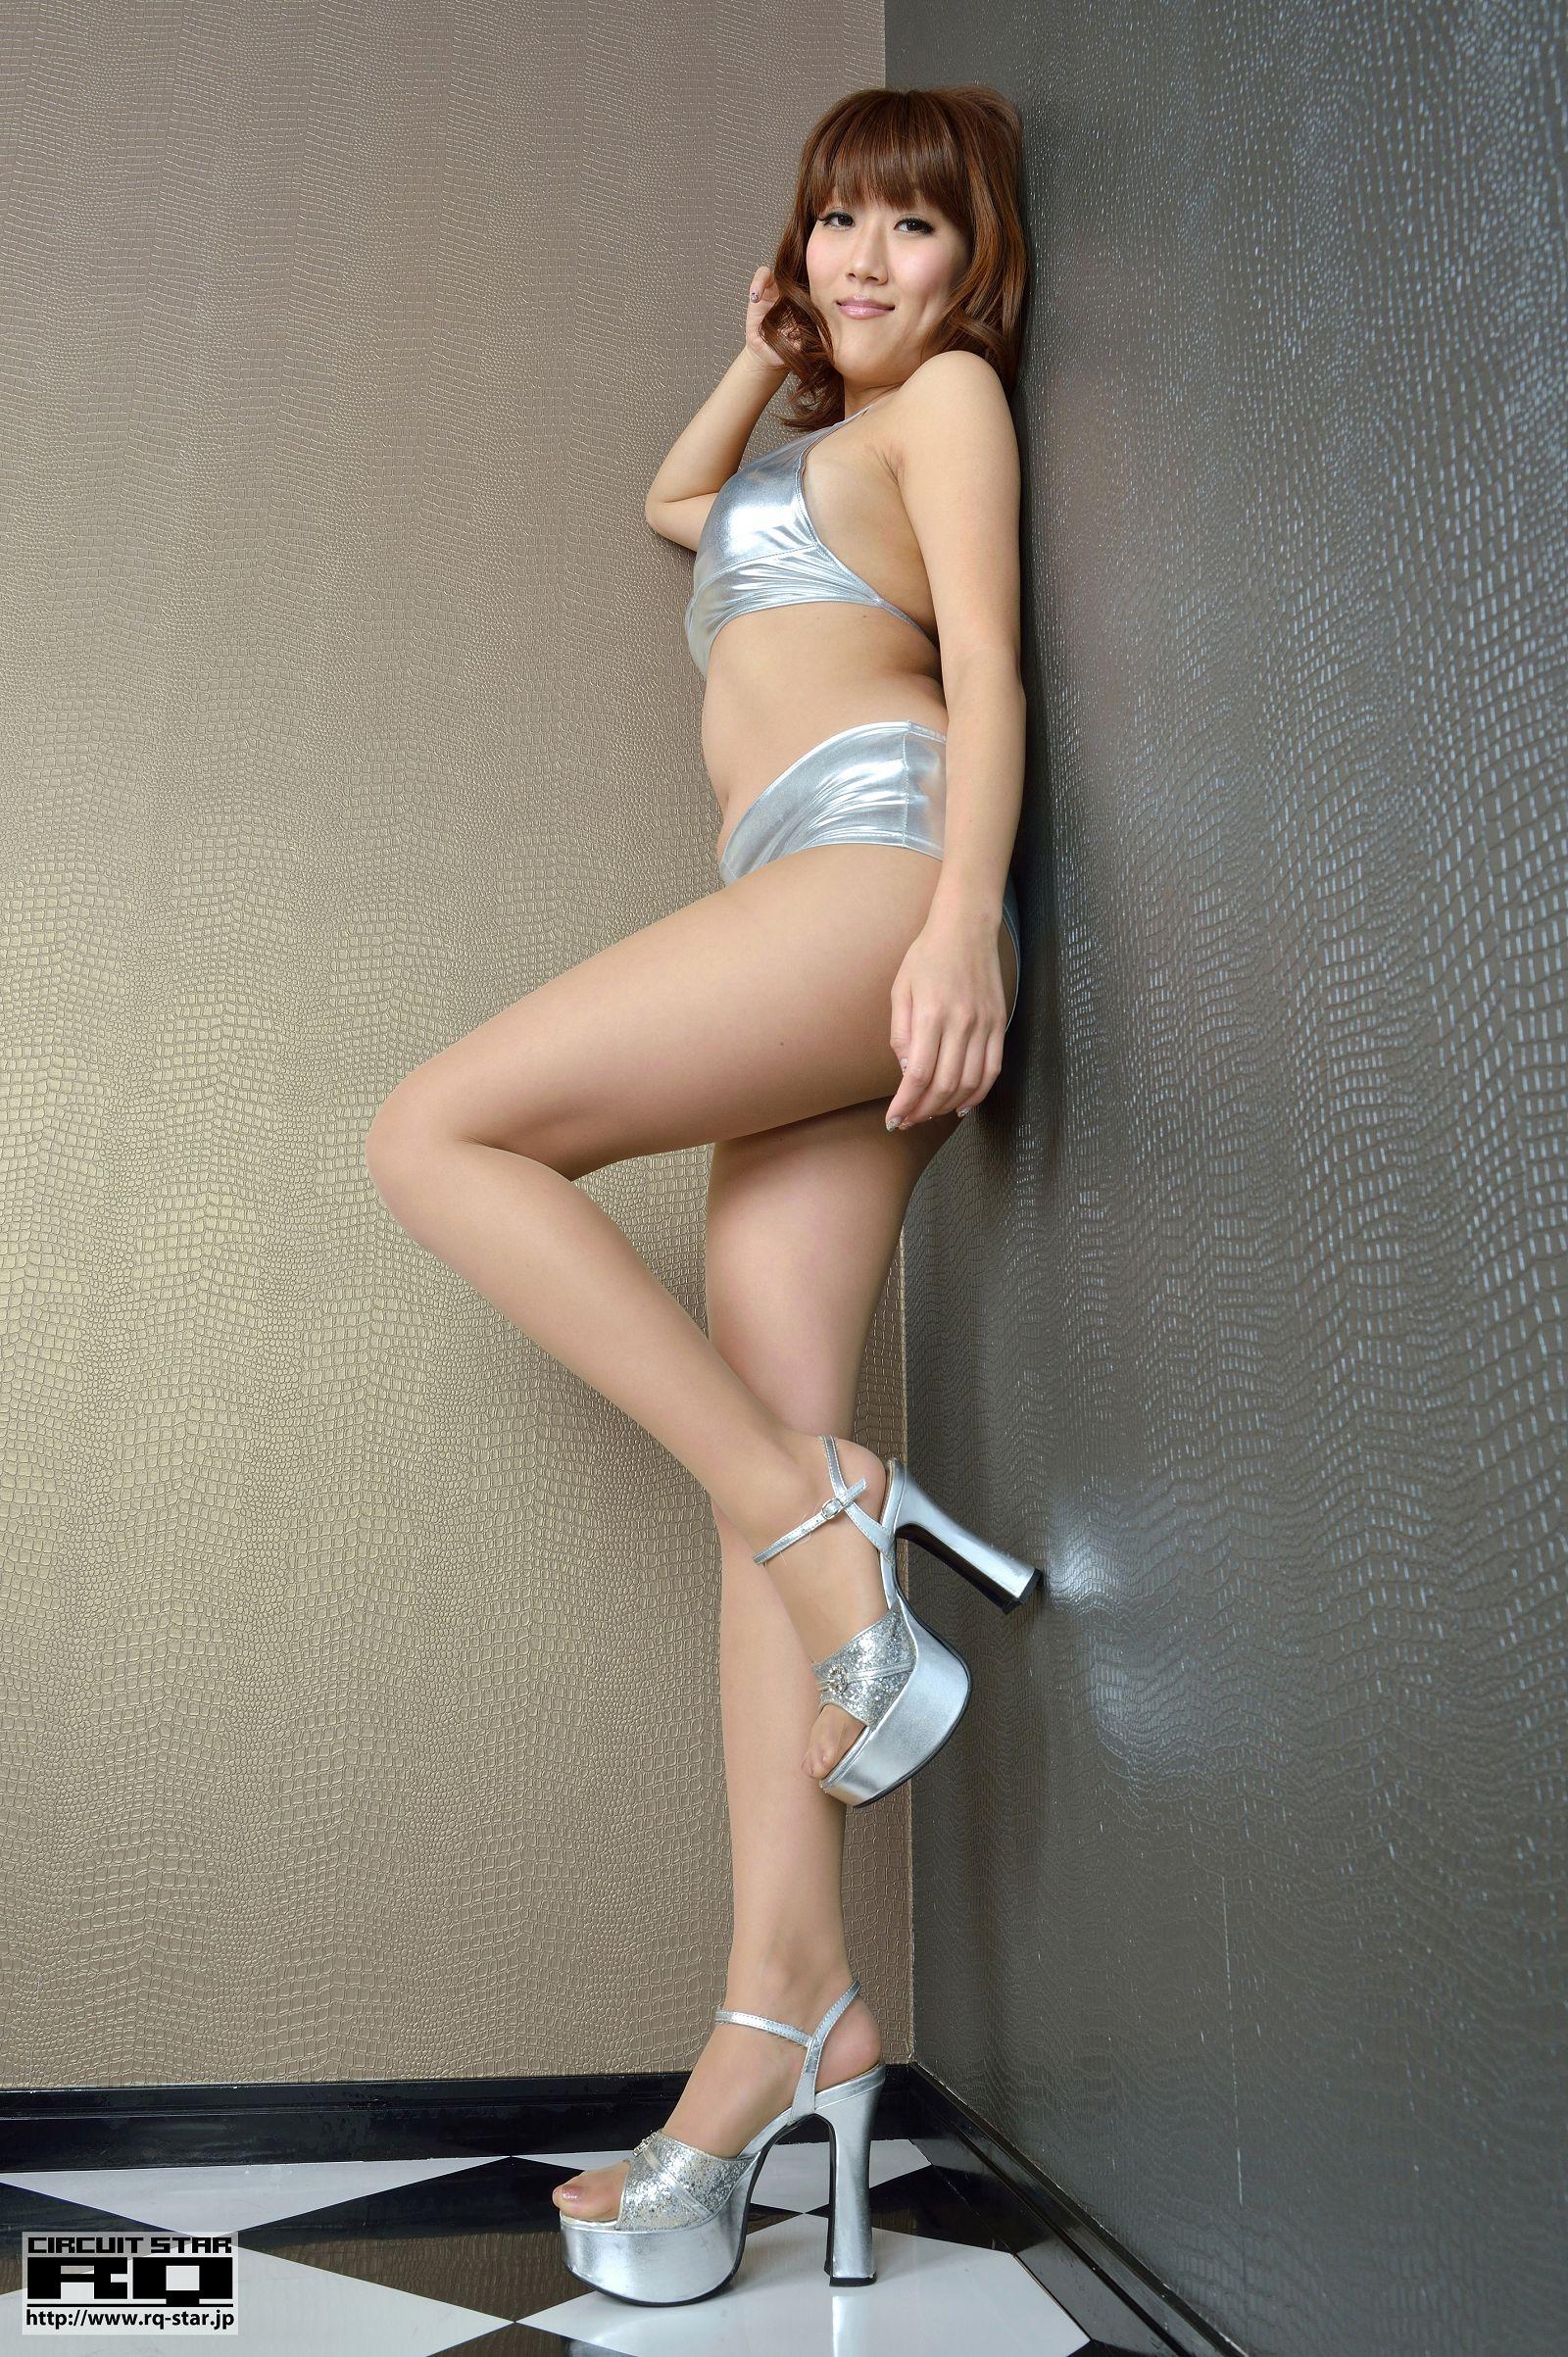 [RQ STAR美女] NO.00767 Yuka Higuchi 樋口結花 Swim Suits[80P] RQ STAR 第4张